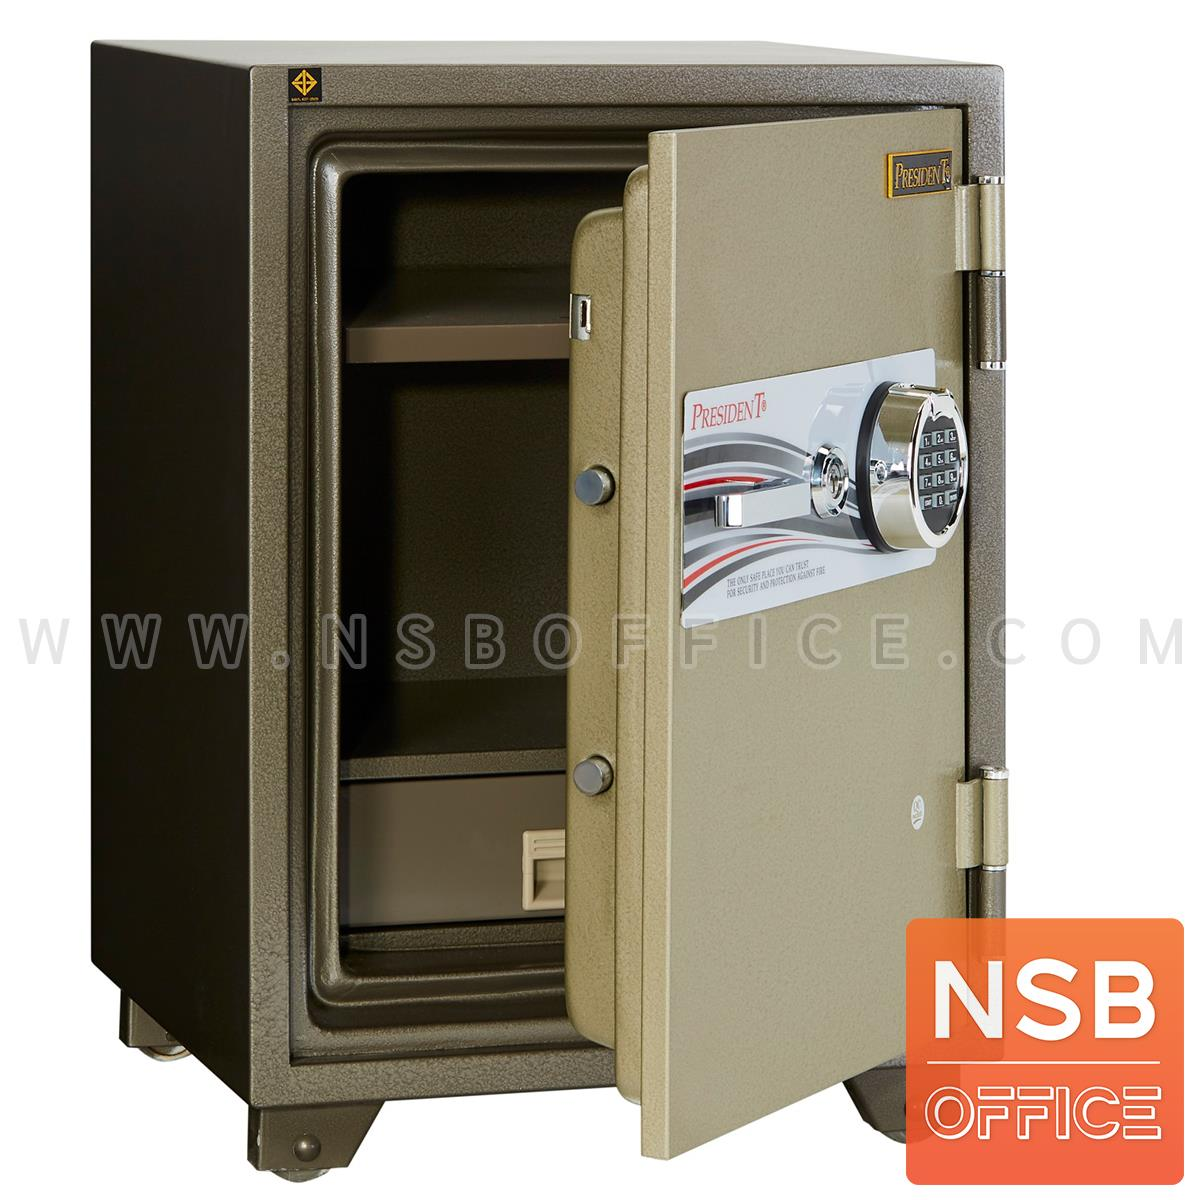 F05A080:ตู้เซฟนิรภัยดิจิตอลระบบสแกนนิ้วมือ 105 กก.  รุ่น PRESIDENT-SMDF 1 กุญแจ 1 รหัส